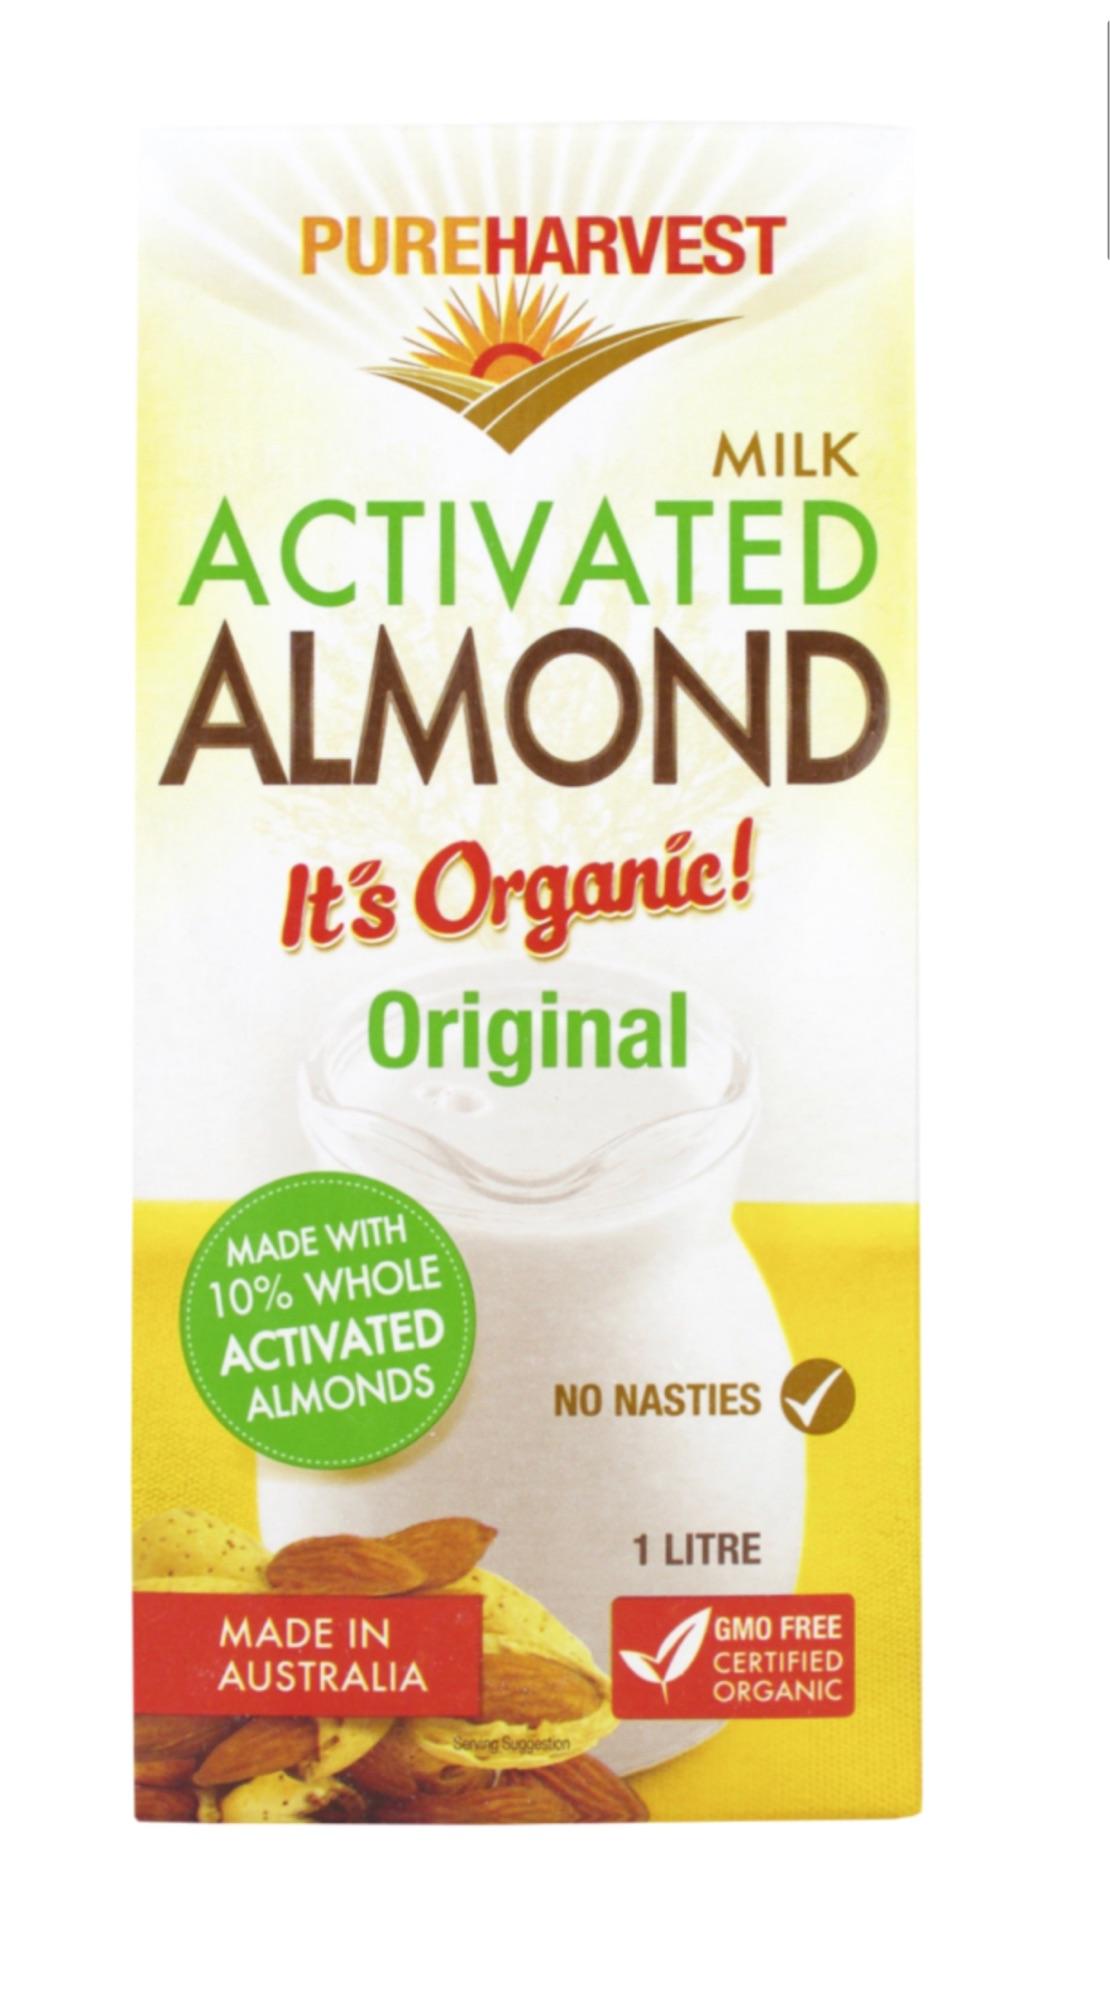 Our Organic Almond Original is made from 10% whole activated almonds. PUREHARVEST เพียวฮาร์เวสต์ ออร์กานิค น้ำนมเมล็ดอัลมอนด์ 1 ลิตร